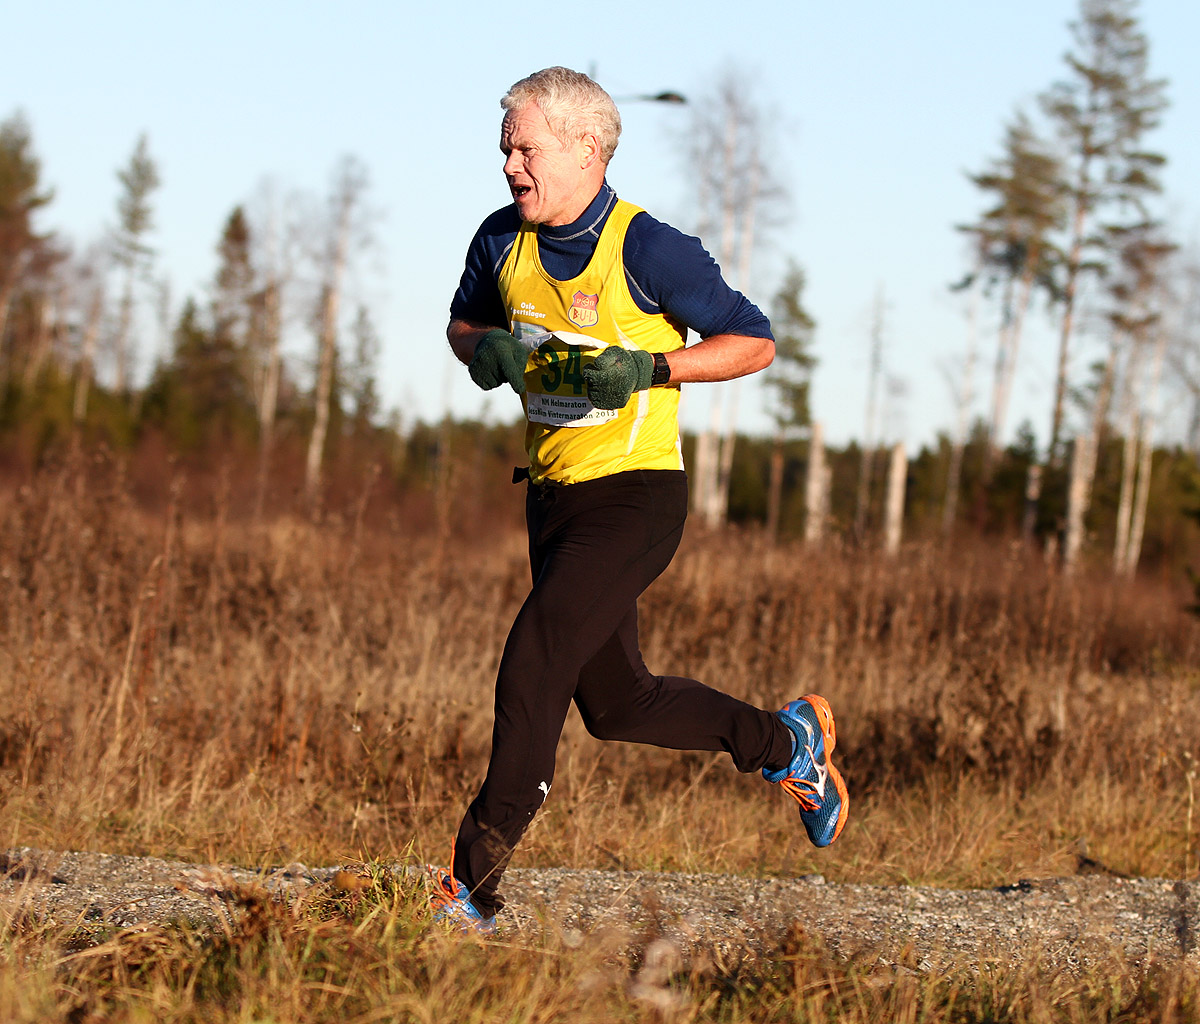 Vintermaraton2013_Bjorn-Gjerde_31-3km.jpg